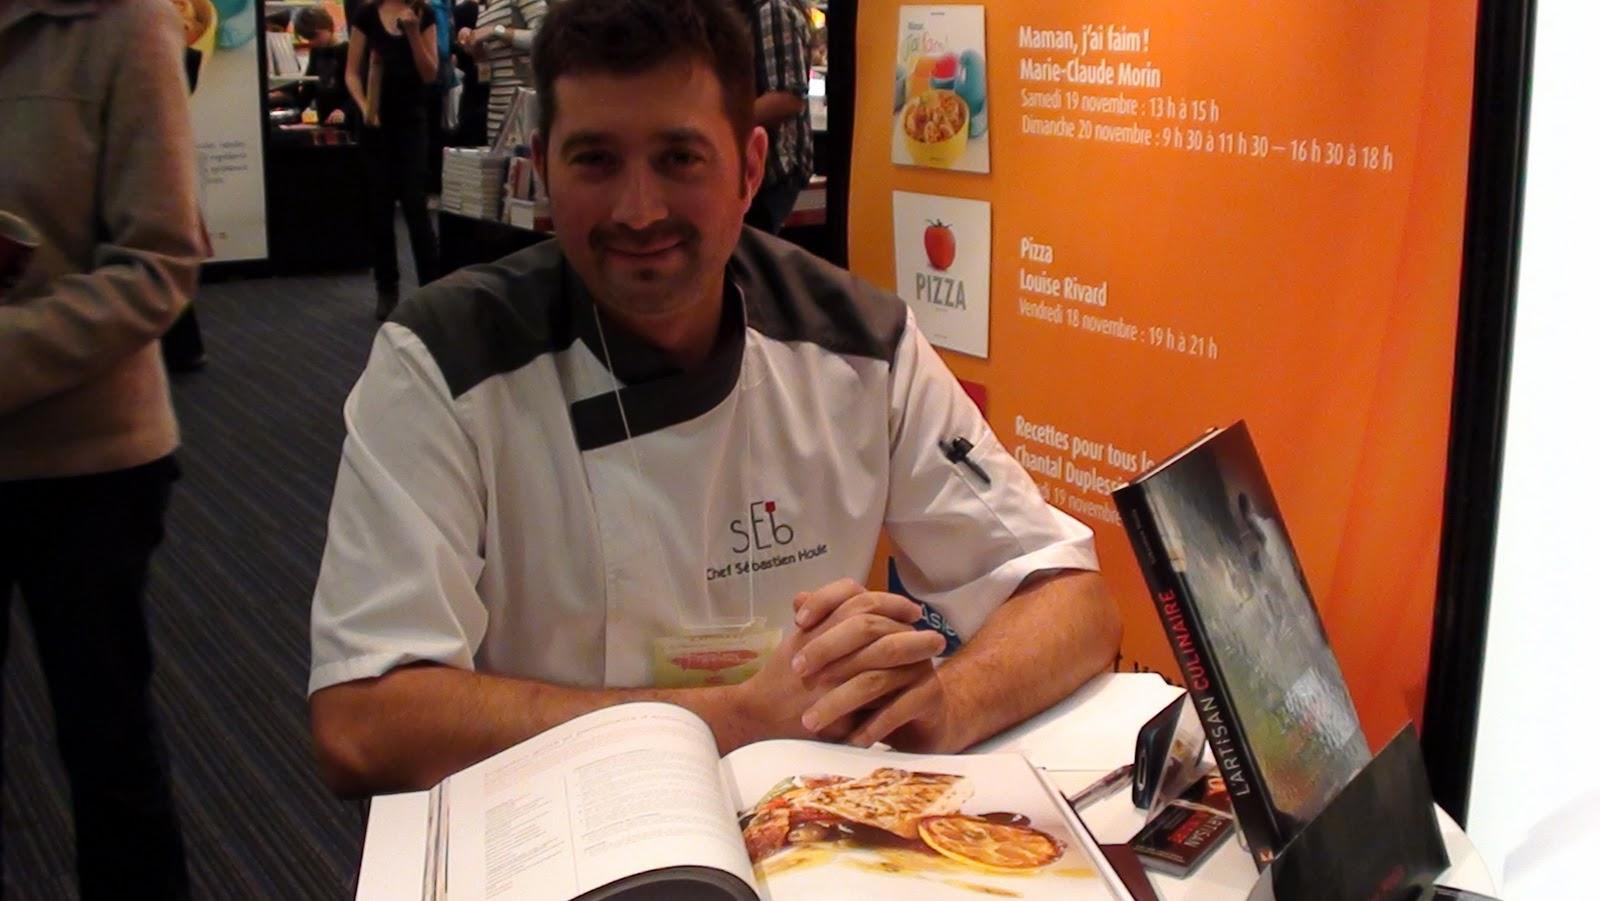 Montreal157 grand livre de cuisine l 39 artisan culinaire - Livre cuisine grand chef ...